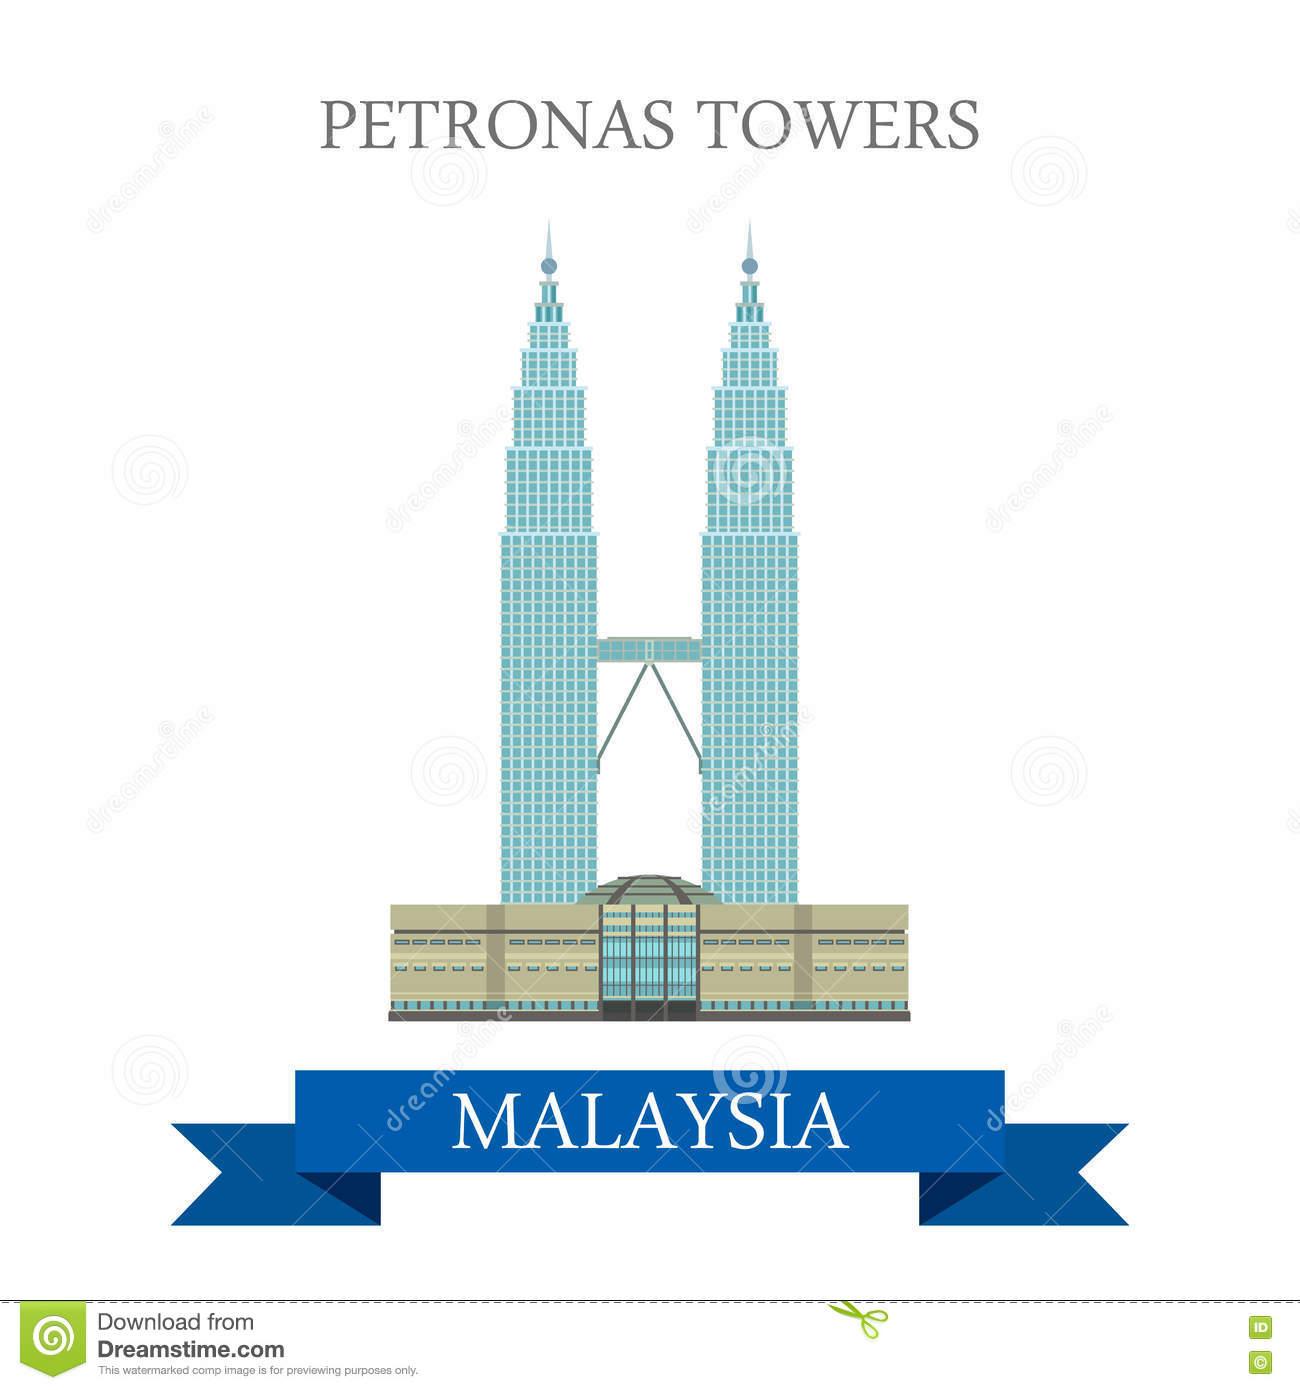 Petronas Twin Towers Kuala Lumpur Malaysia Attraction Travel Stock.